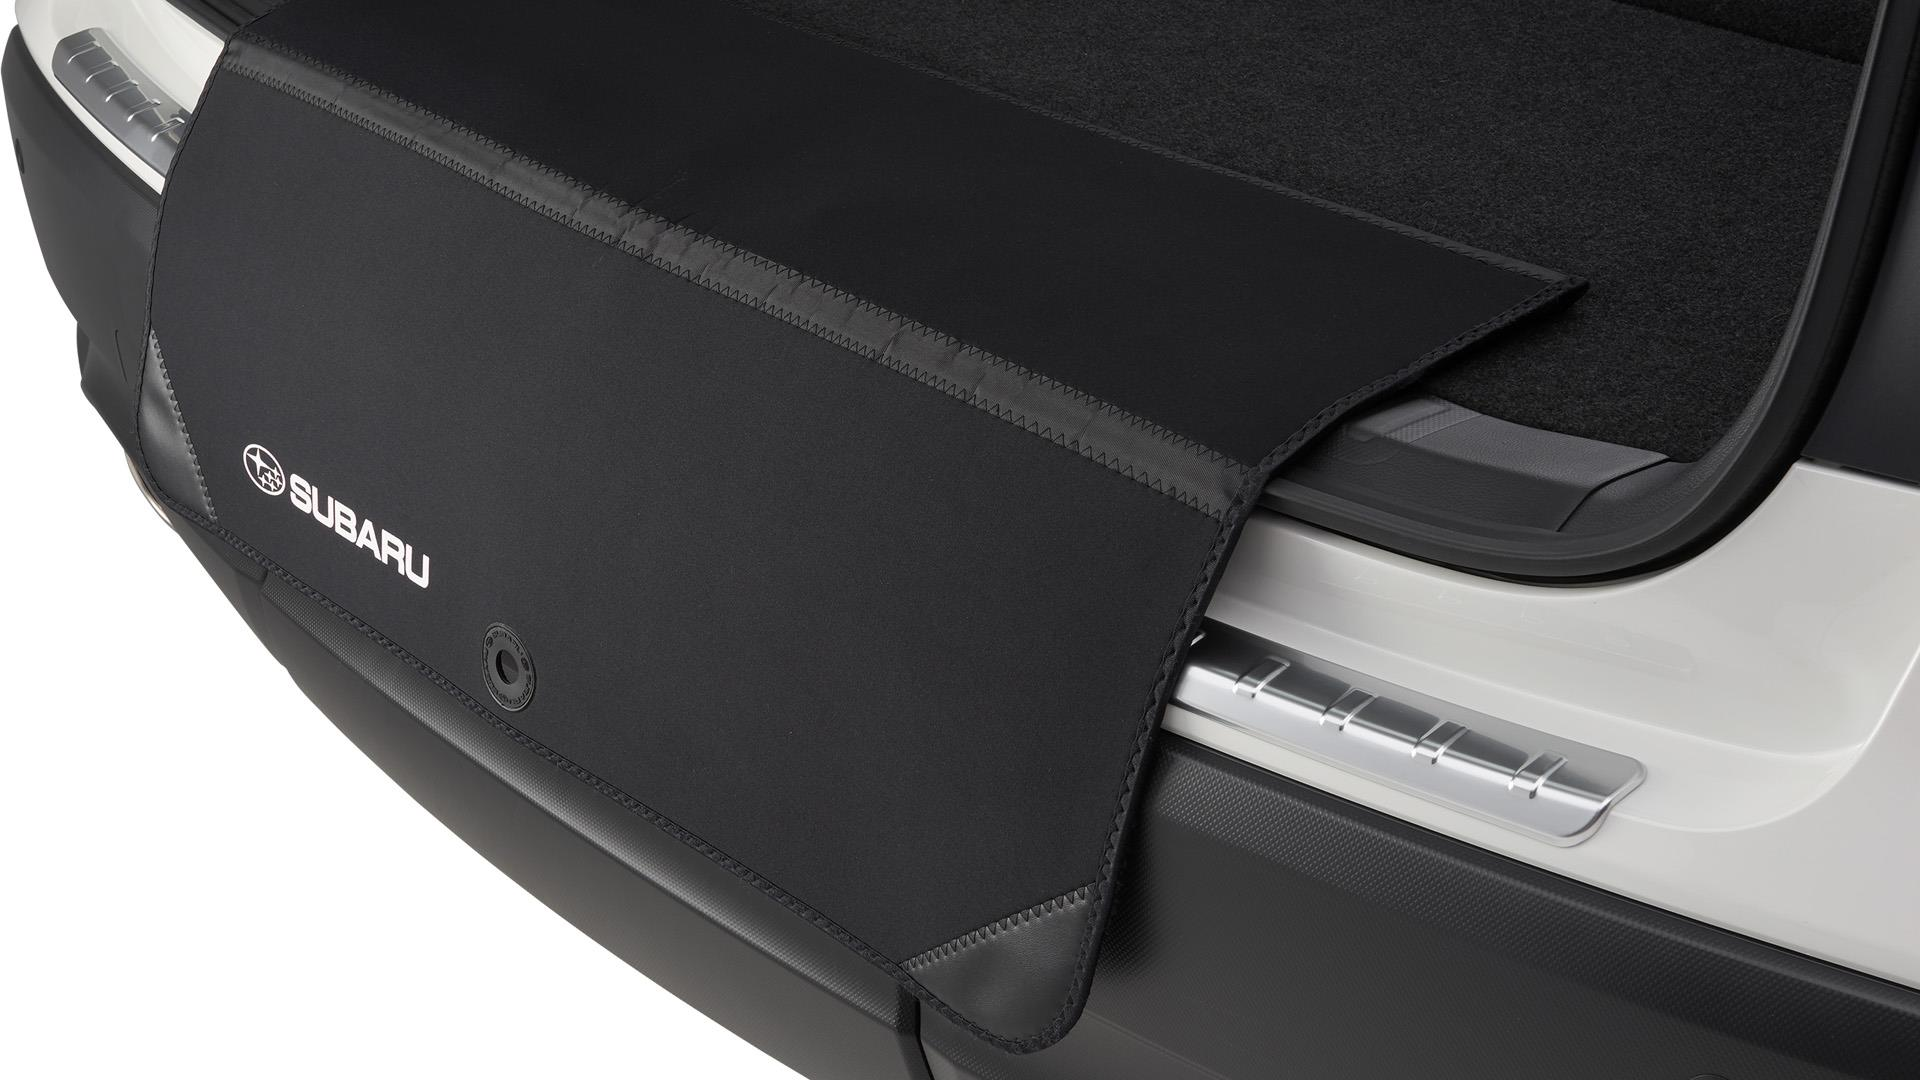 Subaru Outback Rear Bumper Protector E101eaj500 Mike